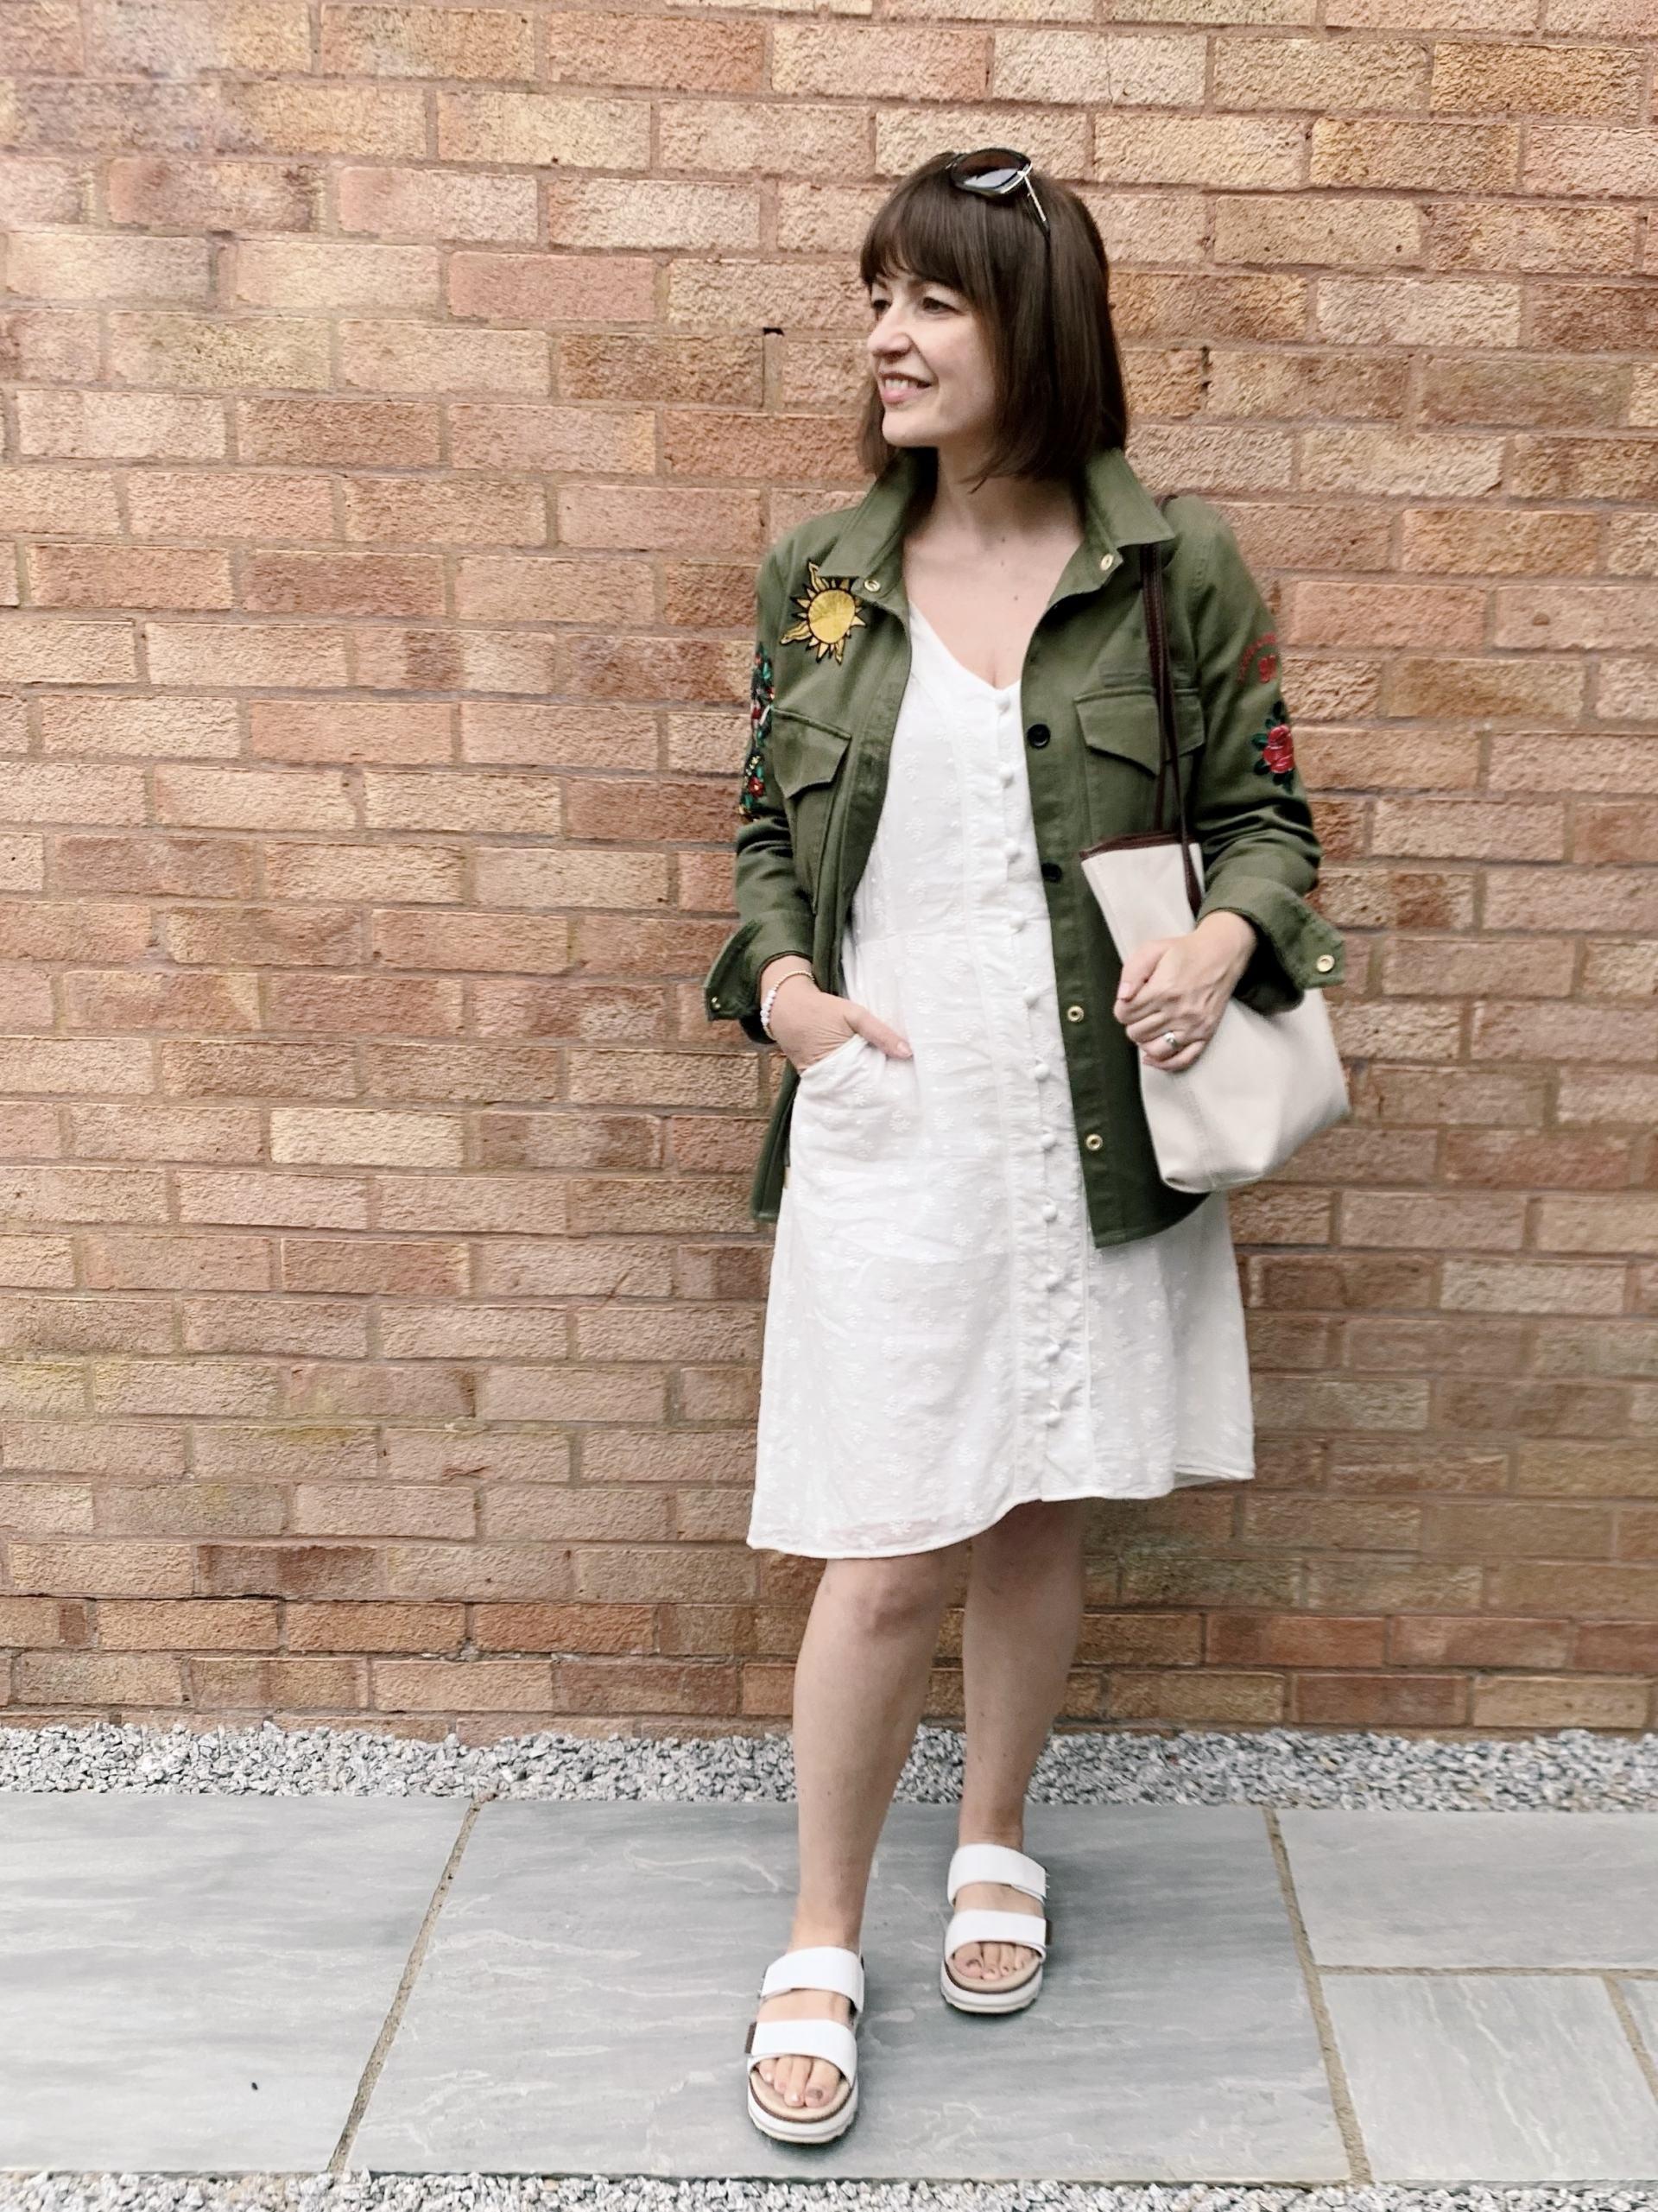 Summer white dress with autumn trend of khaki